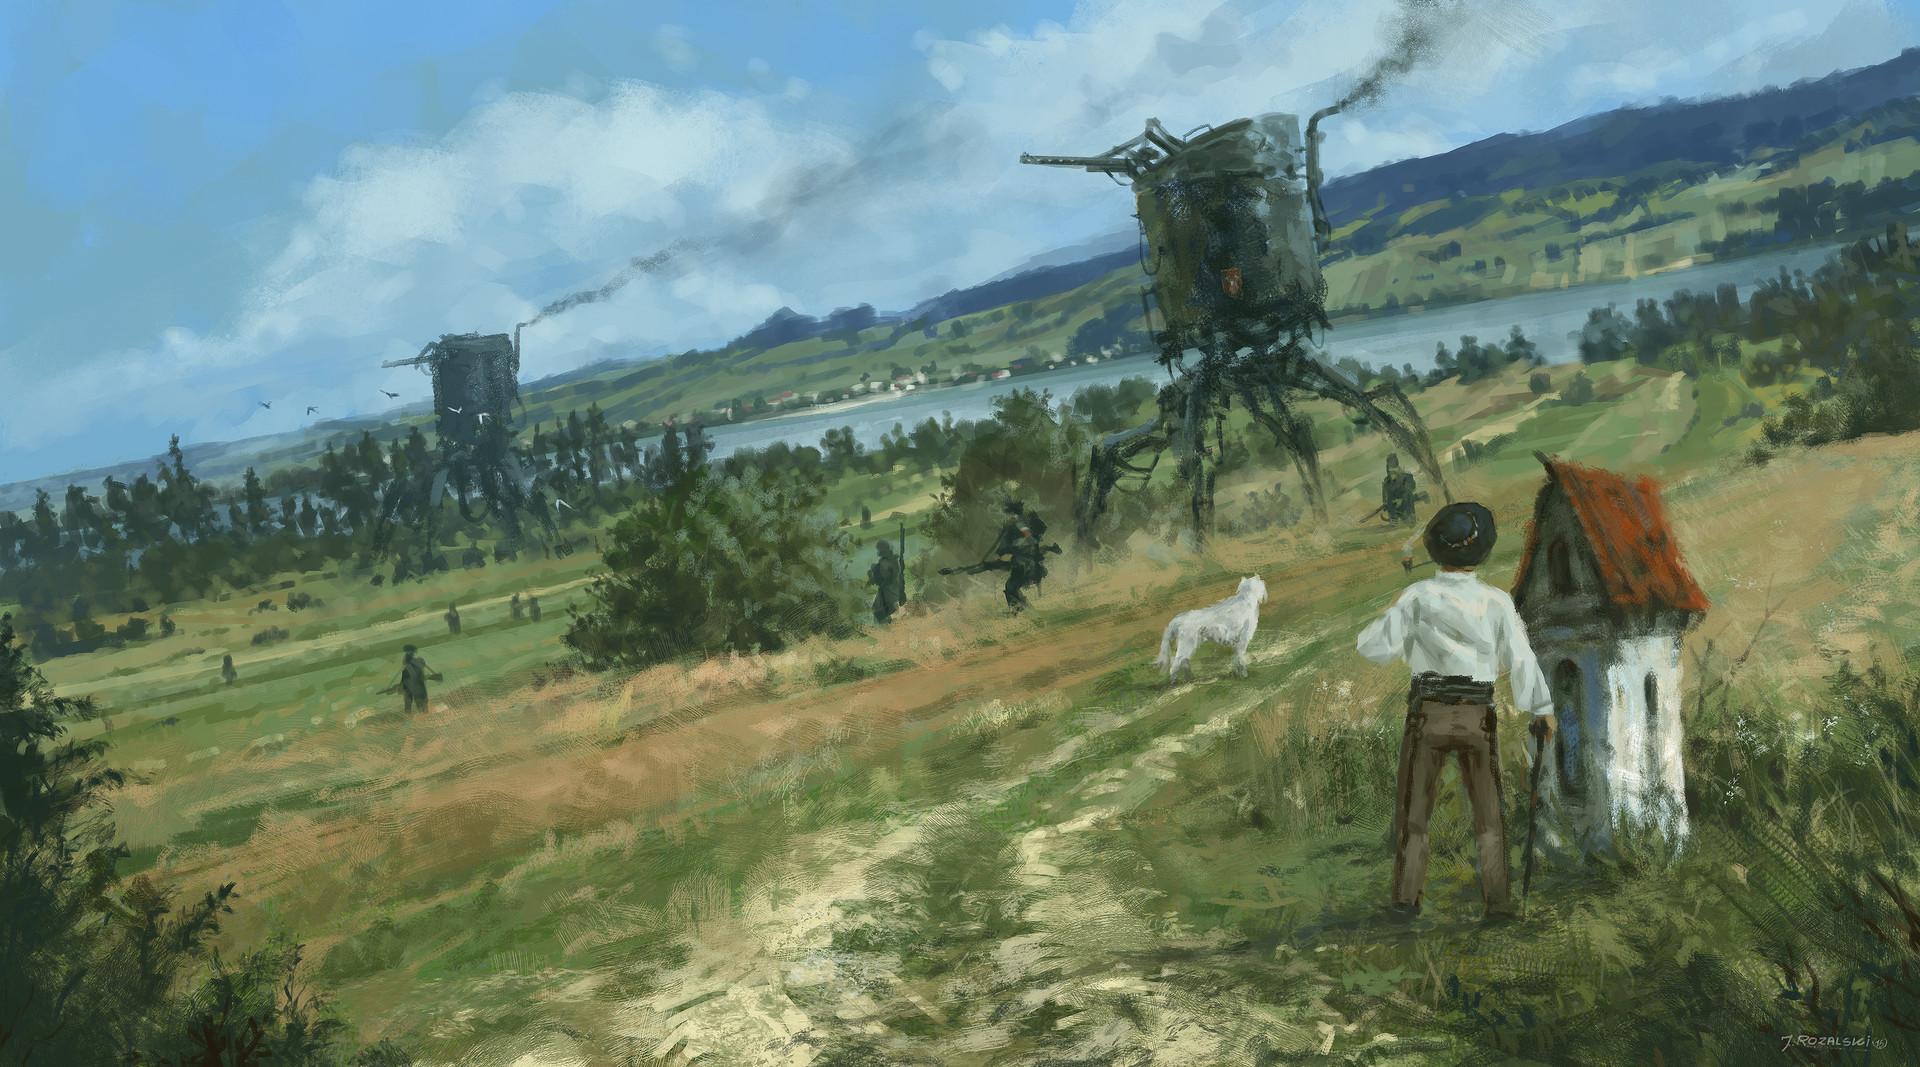 Jakub rozalski 1920 green fields